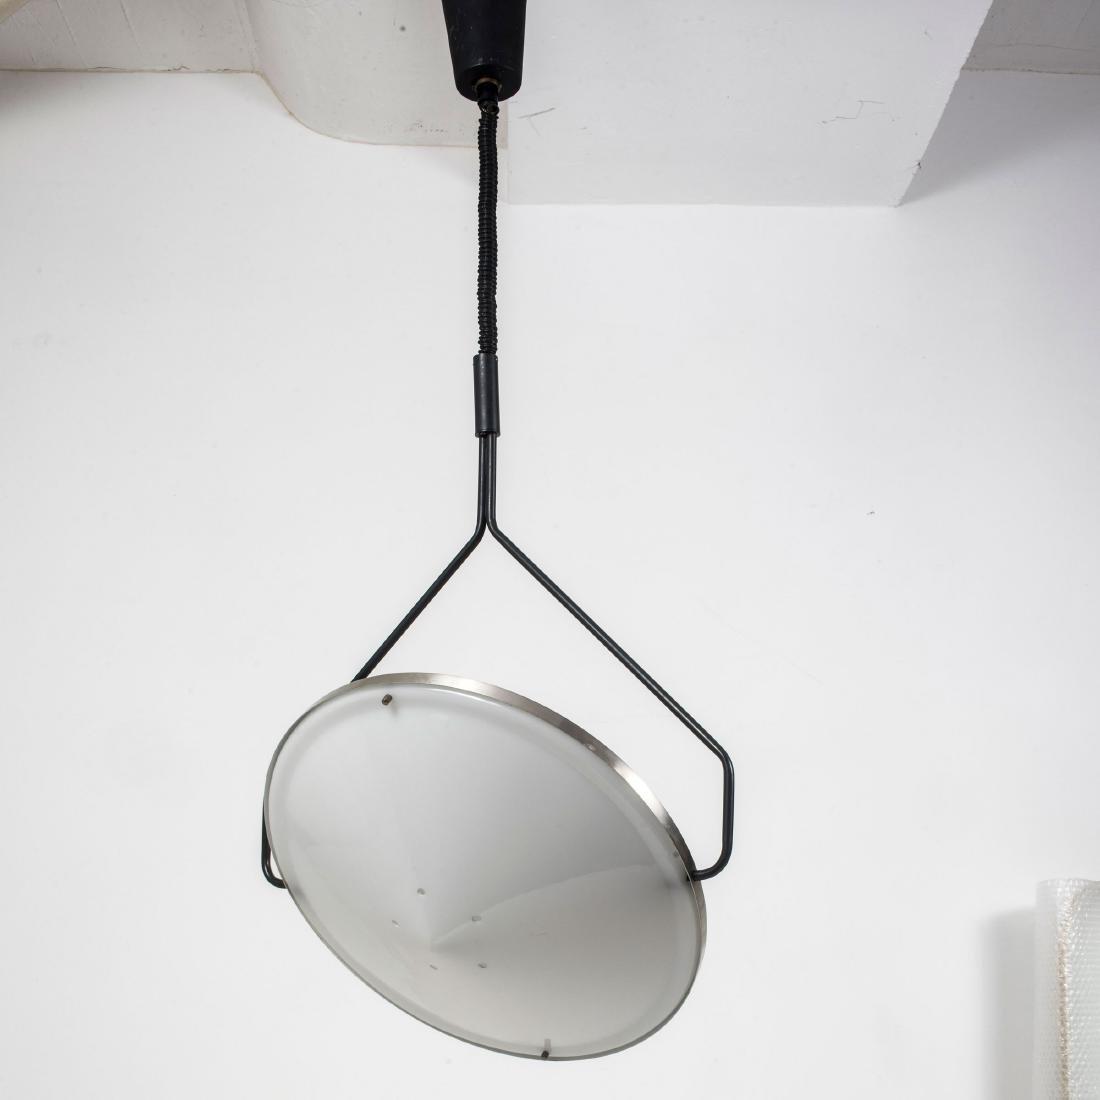 'Cardan' ceiling light, c. 1970 - 4